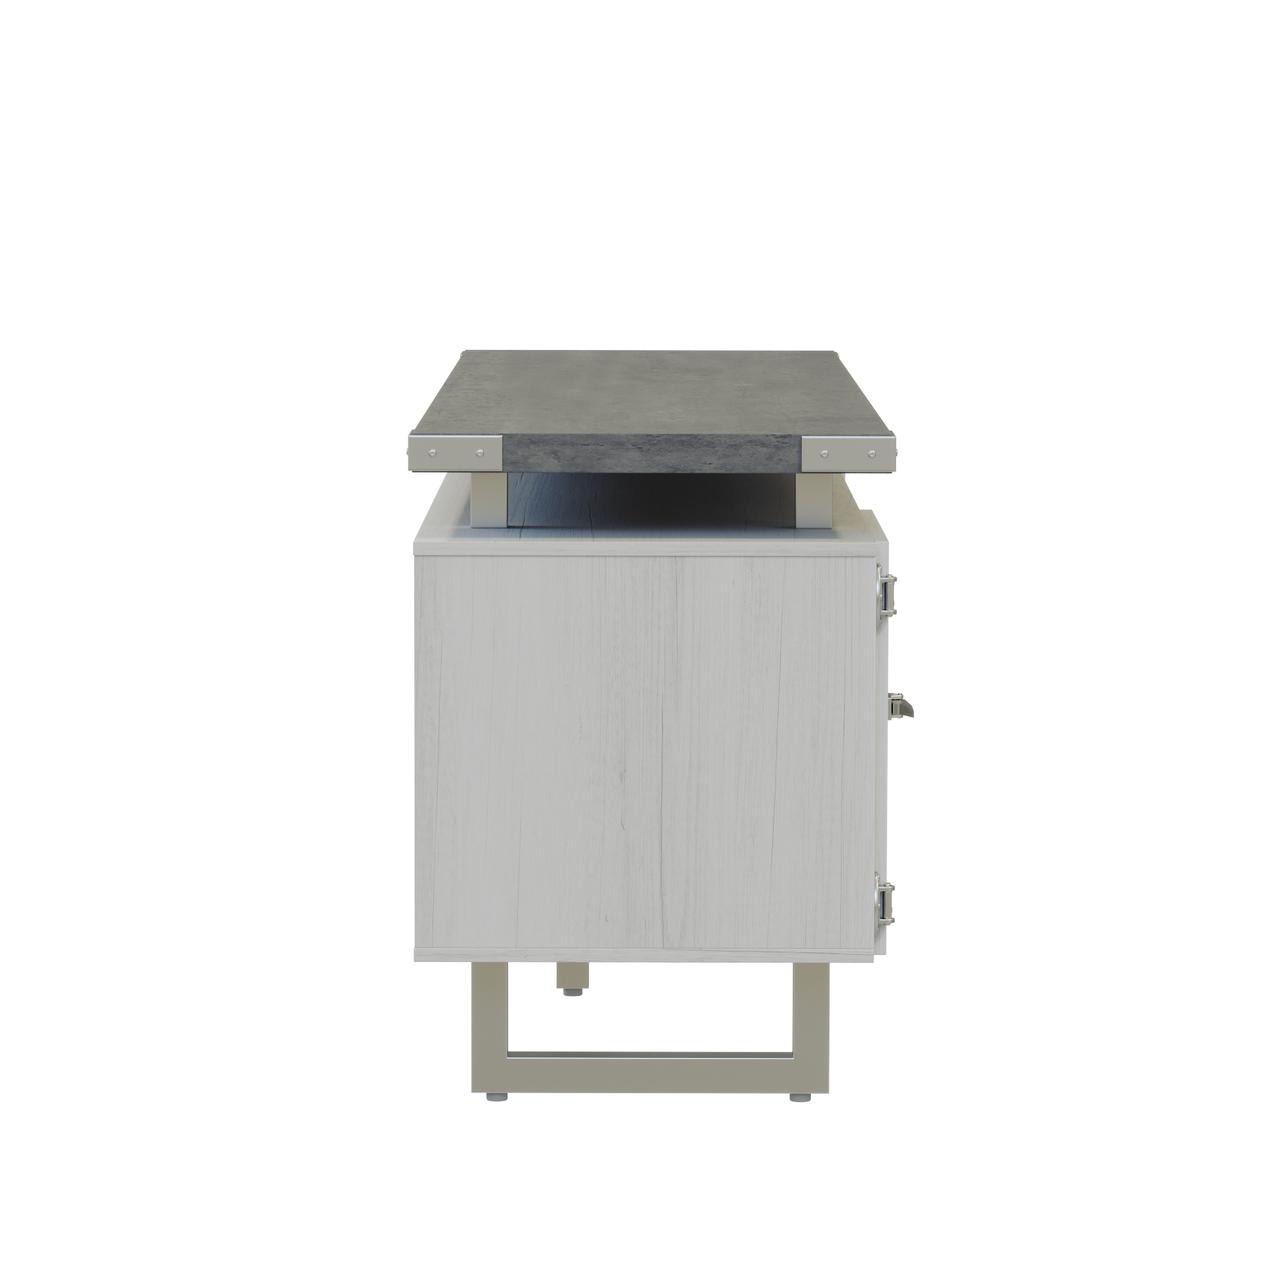 mirella low wall cabinet with stone gray laminate finish